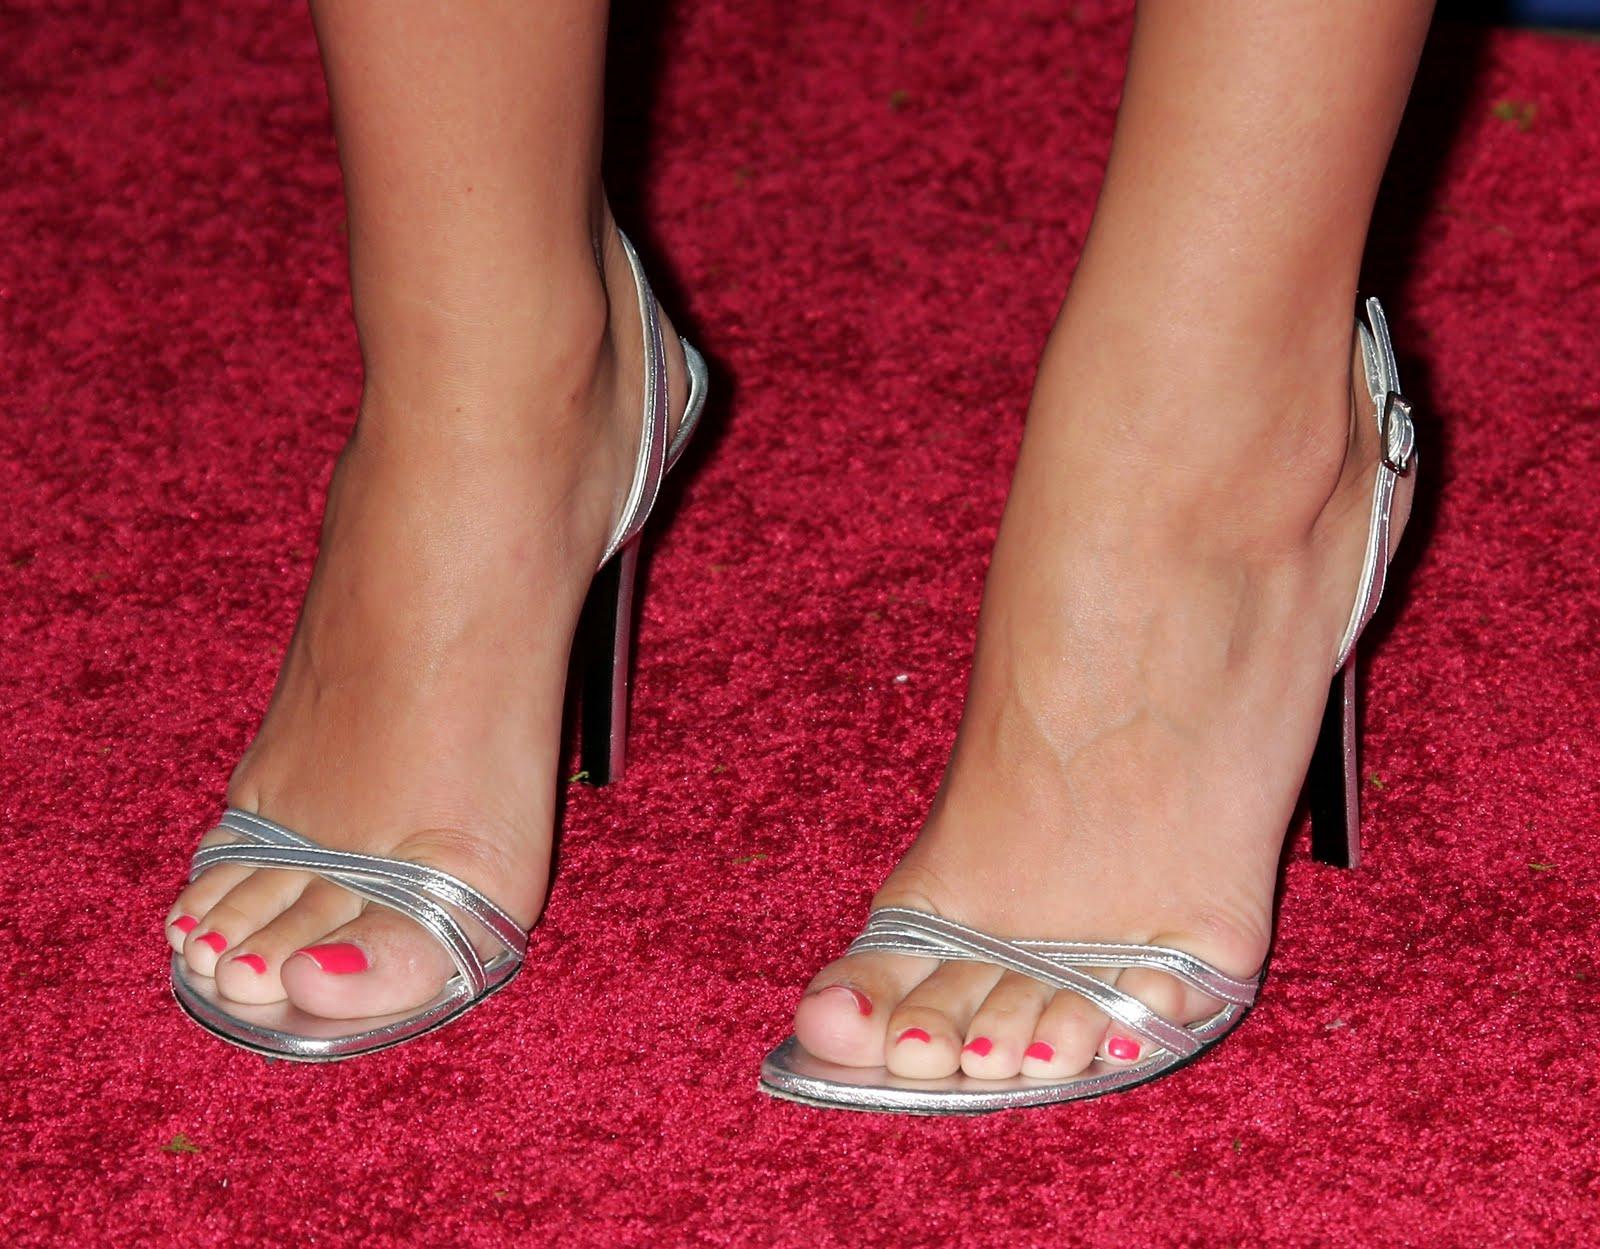 Bigfoot Celebrity: Katharine McPhee Feet